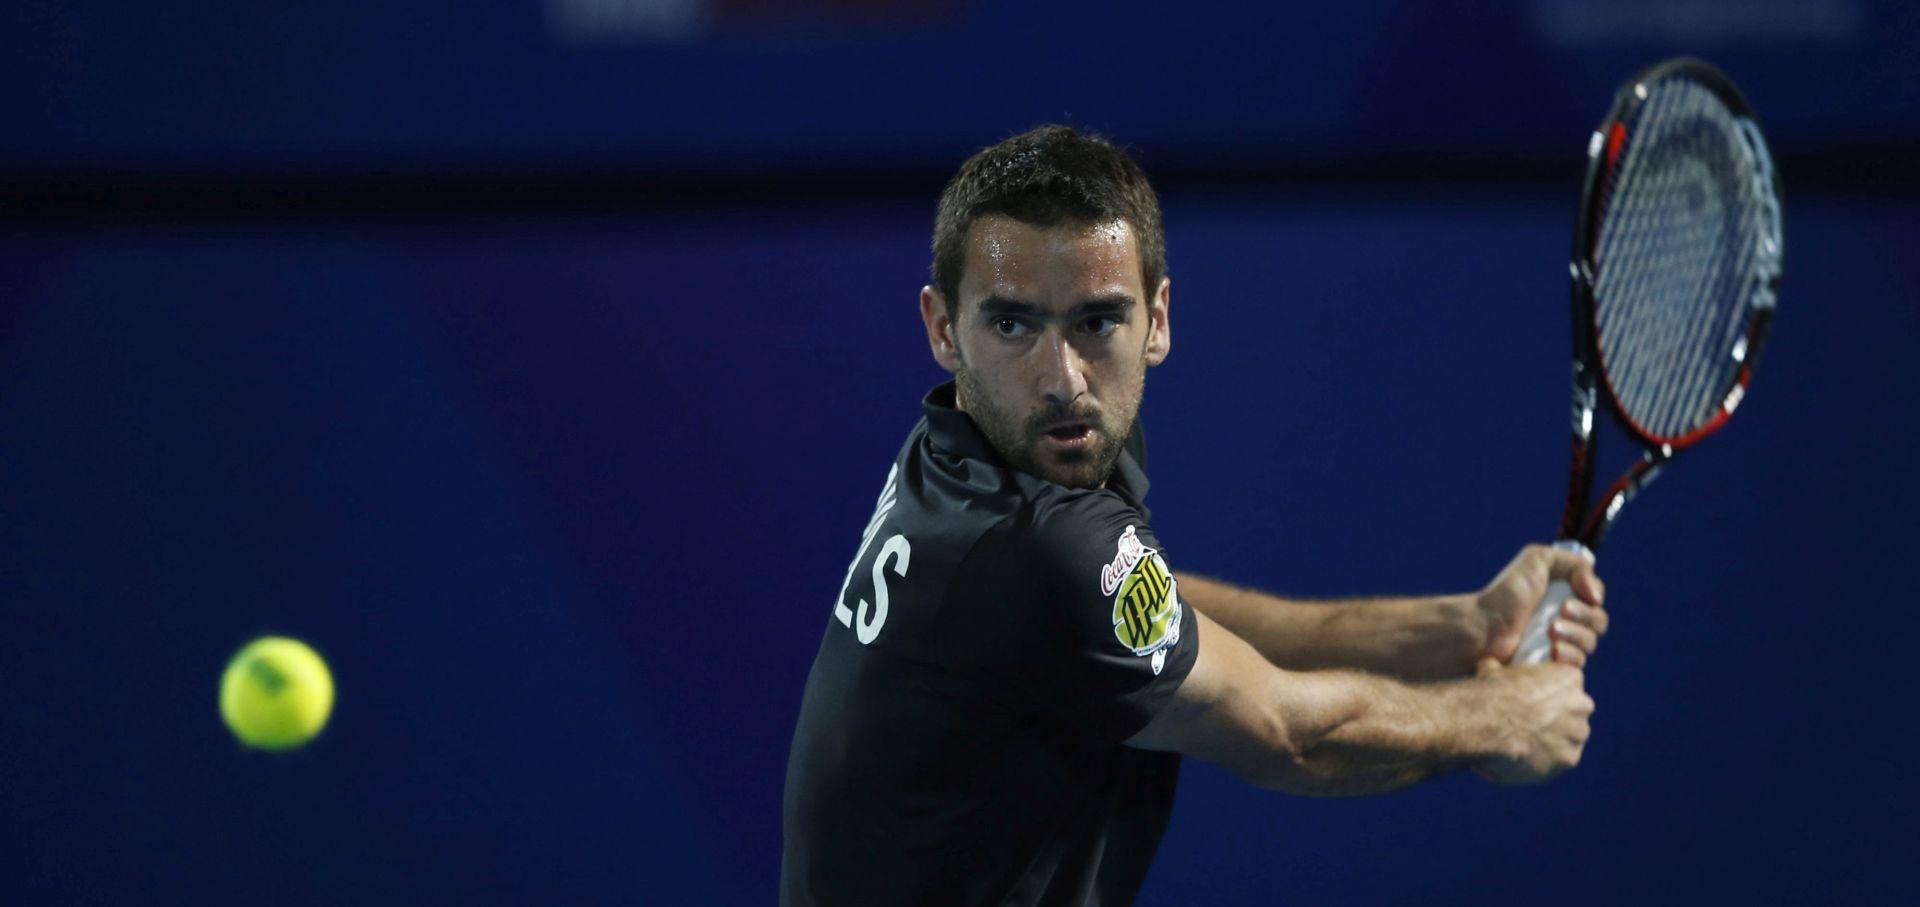 ATP BRISBANE Čilić ostao bez polufinala, svladao ga Thiem